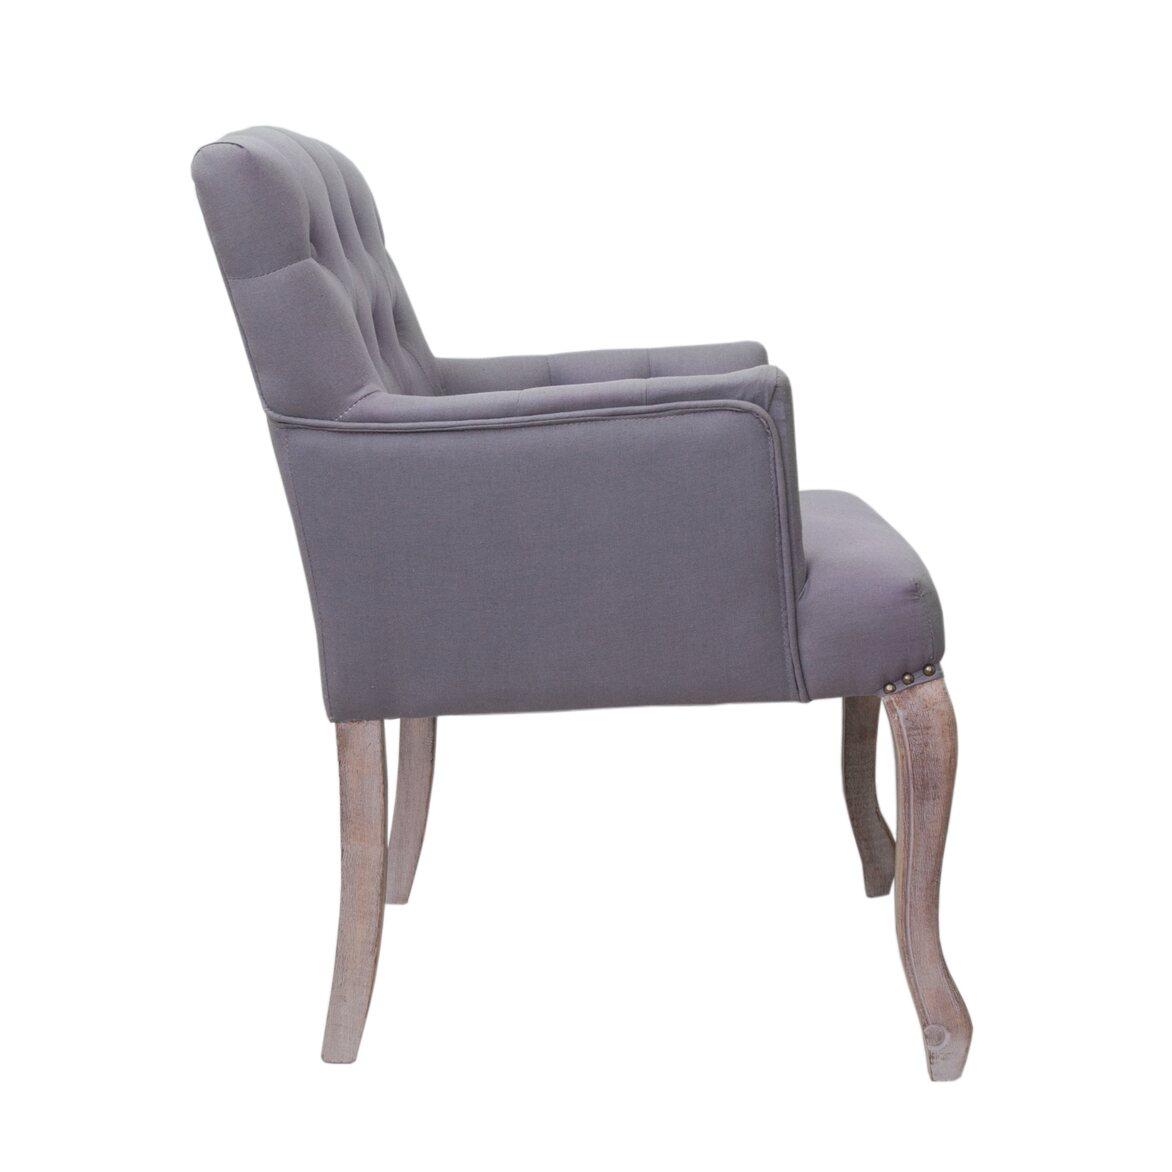 Кресло Deron grey ver.2 2 | Кресло-стул Kingsby